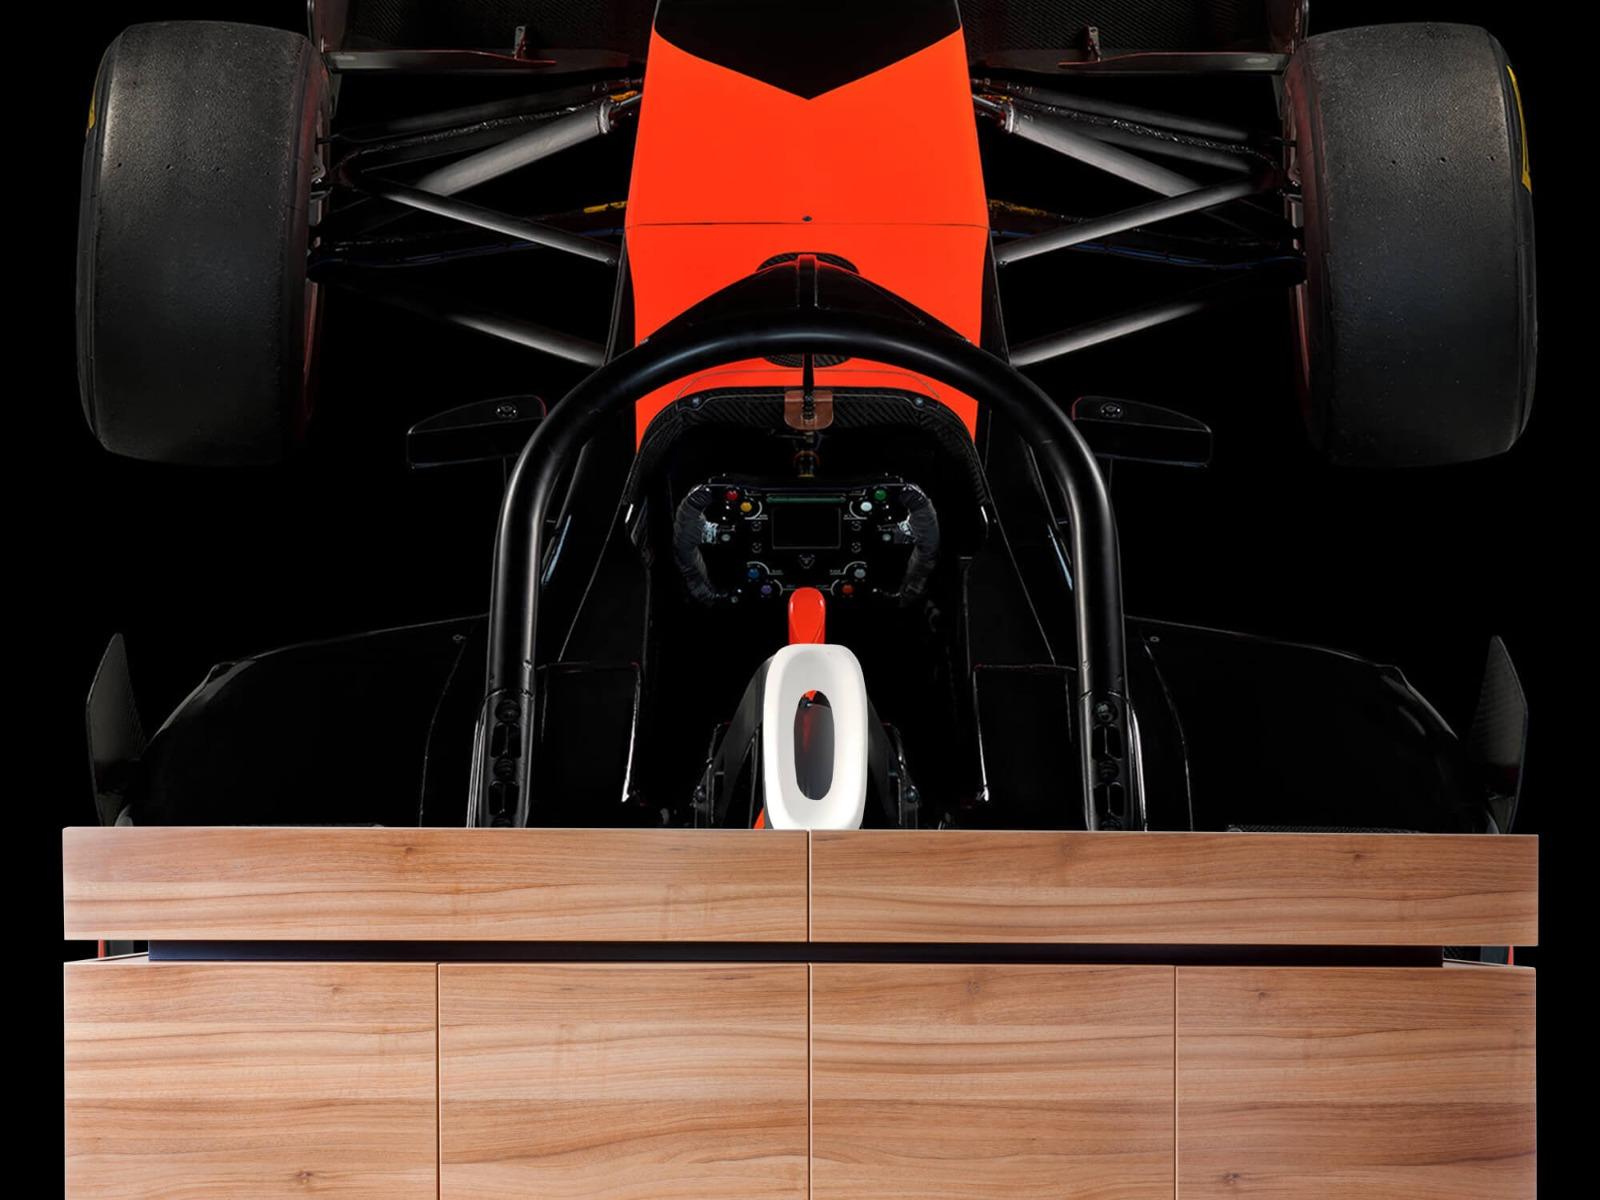 Sportauto's - Formule 3 - Cockpit view - dark - Tienerkamer 20